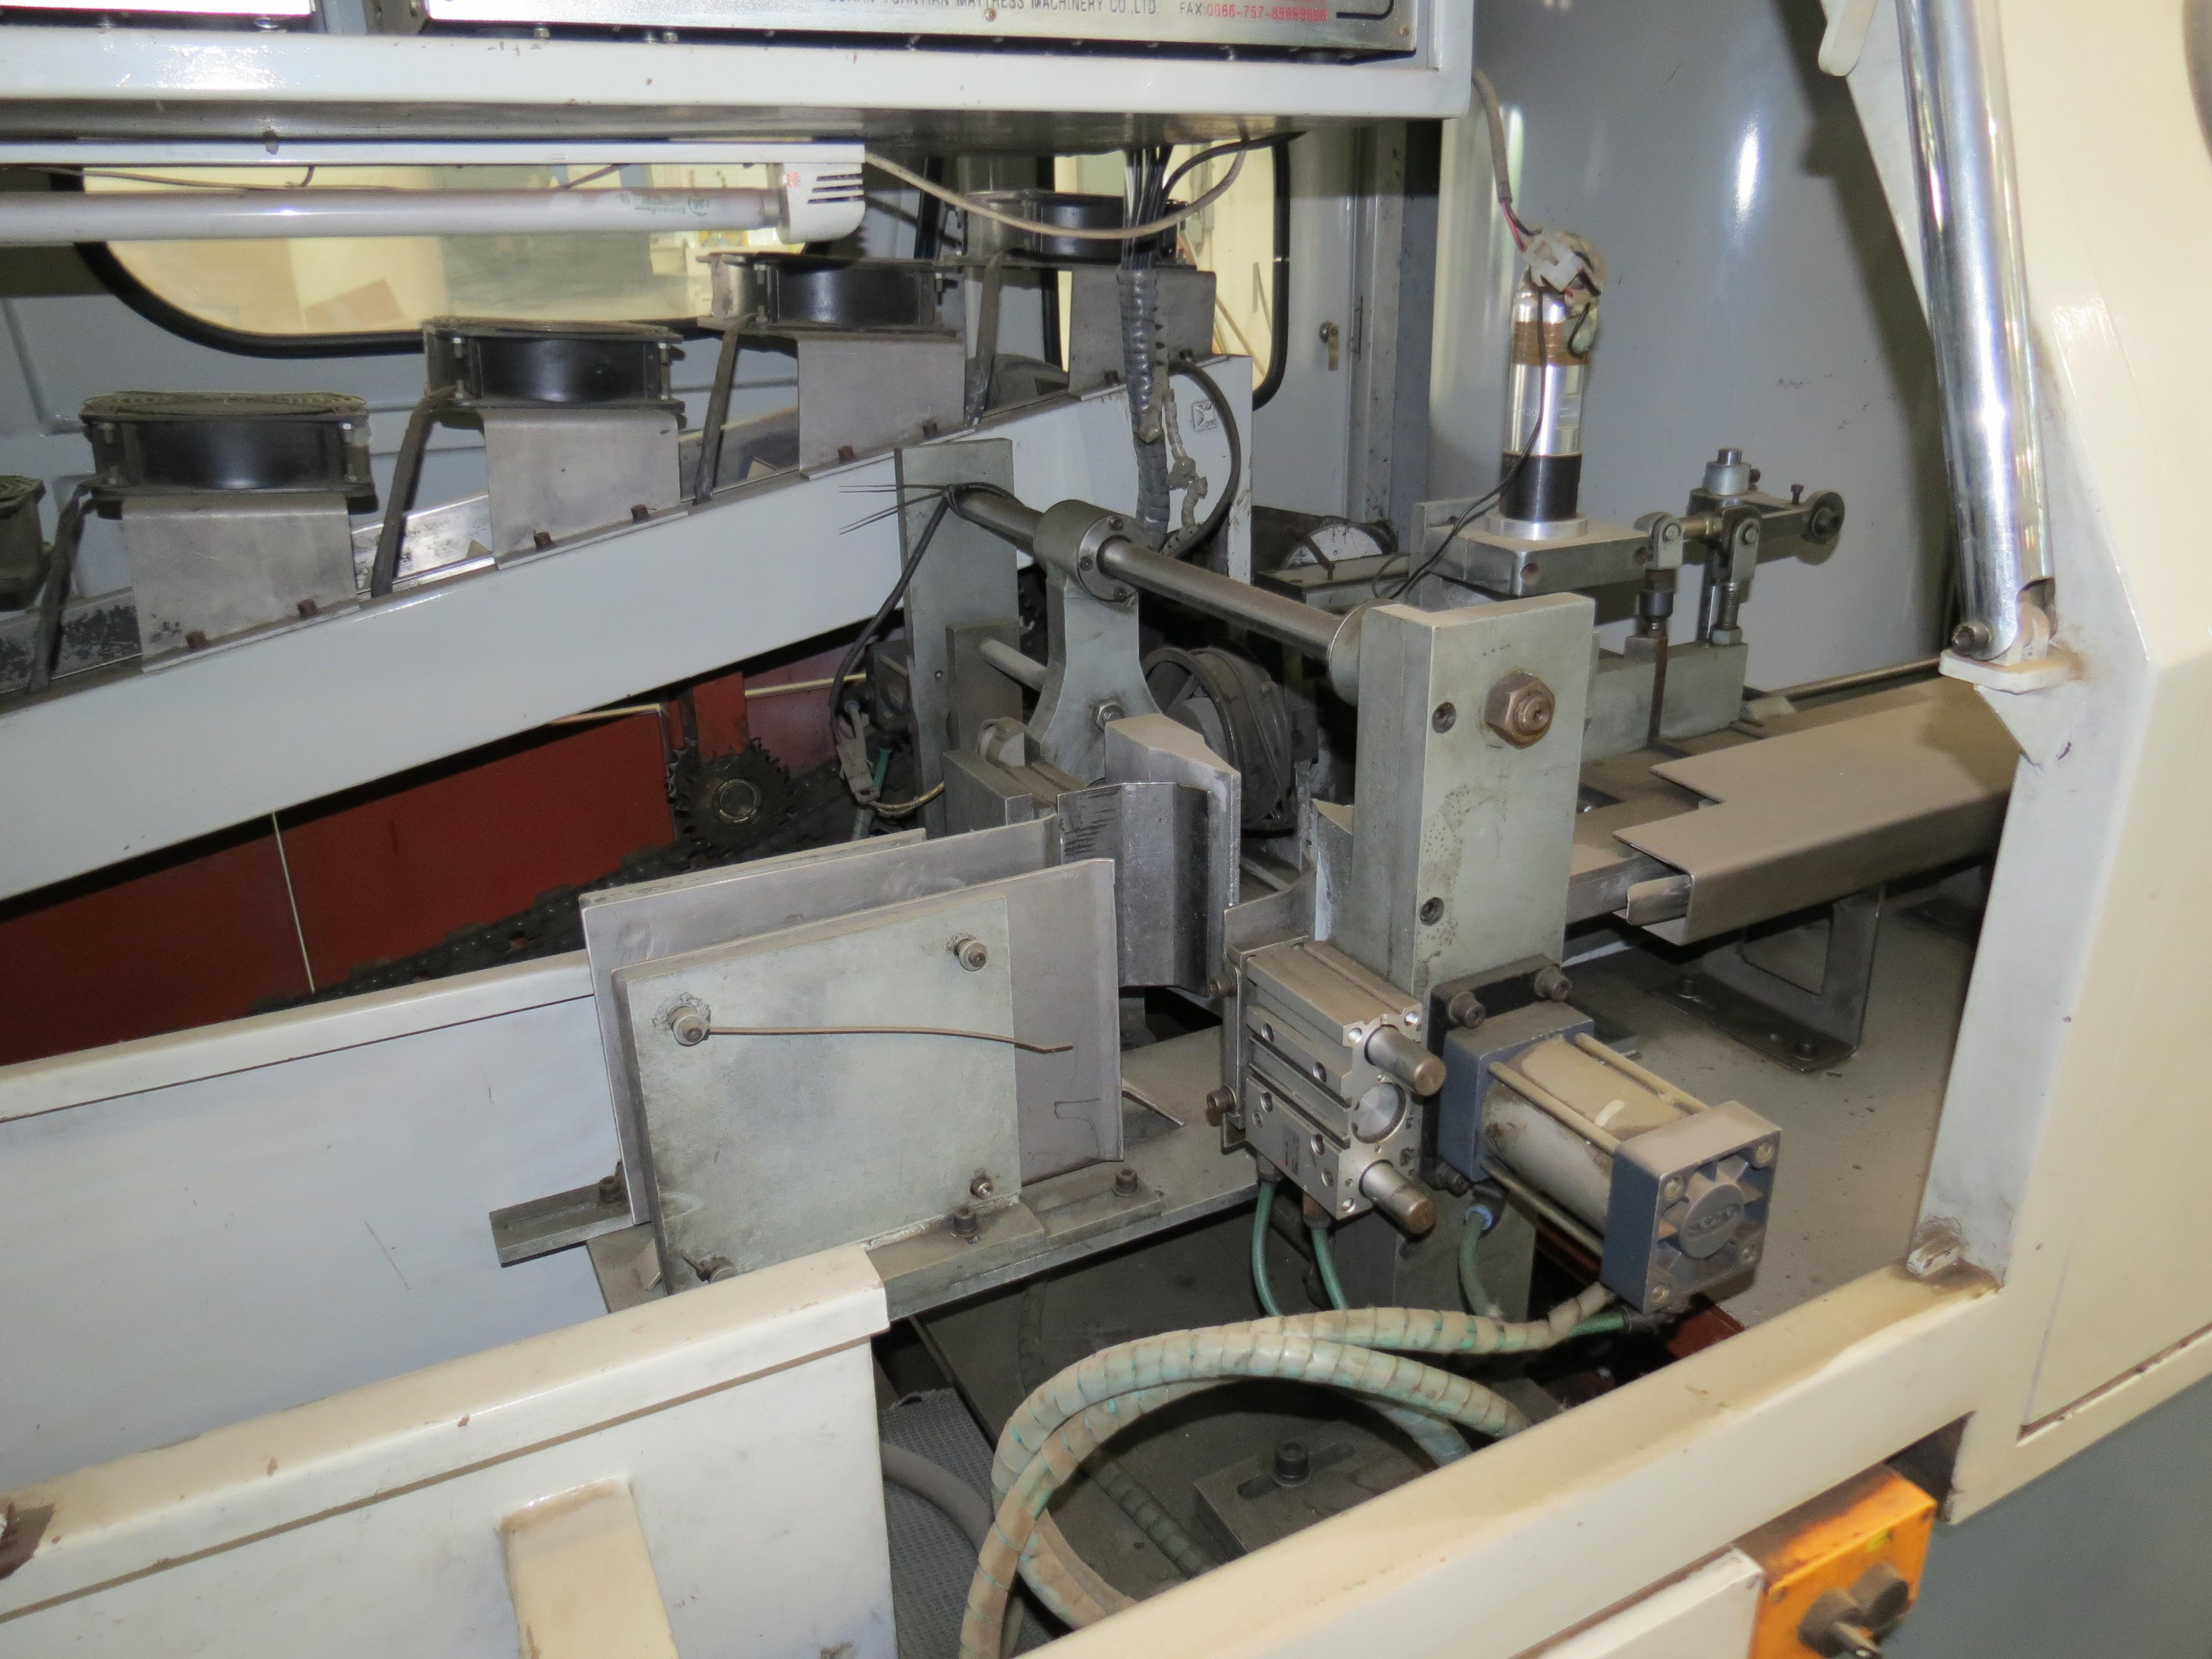 Foshan Yuatian Mattress Machine DZ-6AAutomatic Pocket Spring Machine, 220V, SN:0905005022 - Image 5 of 5